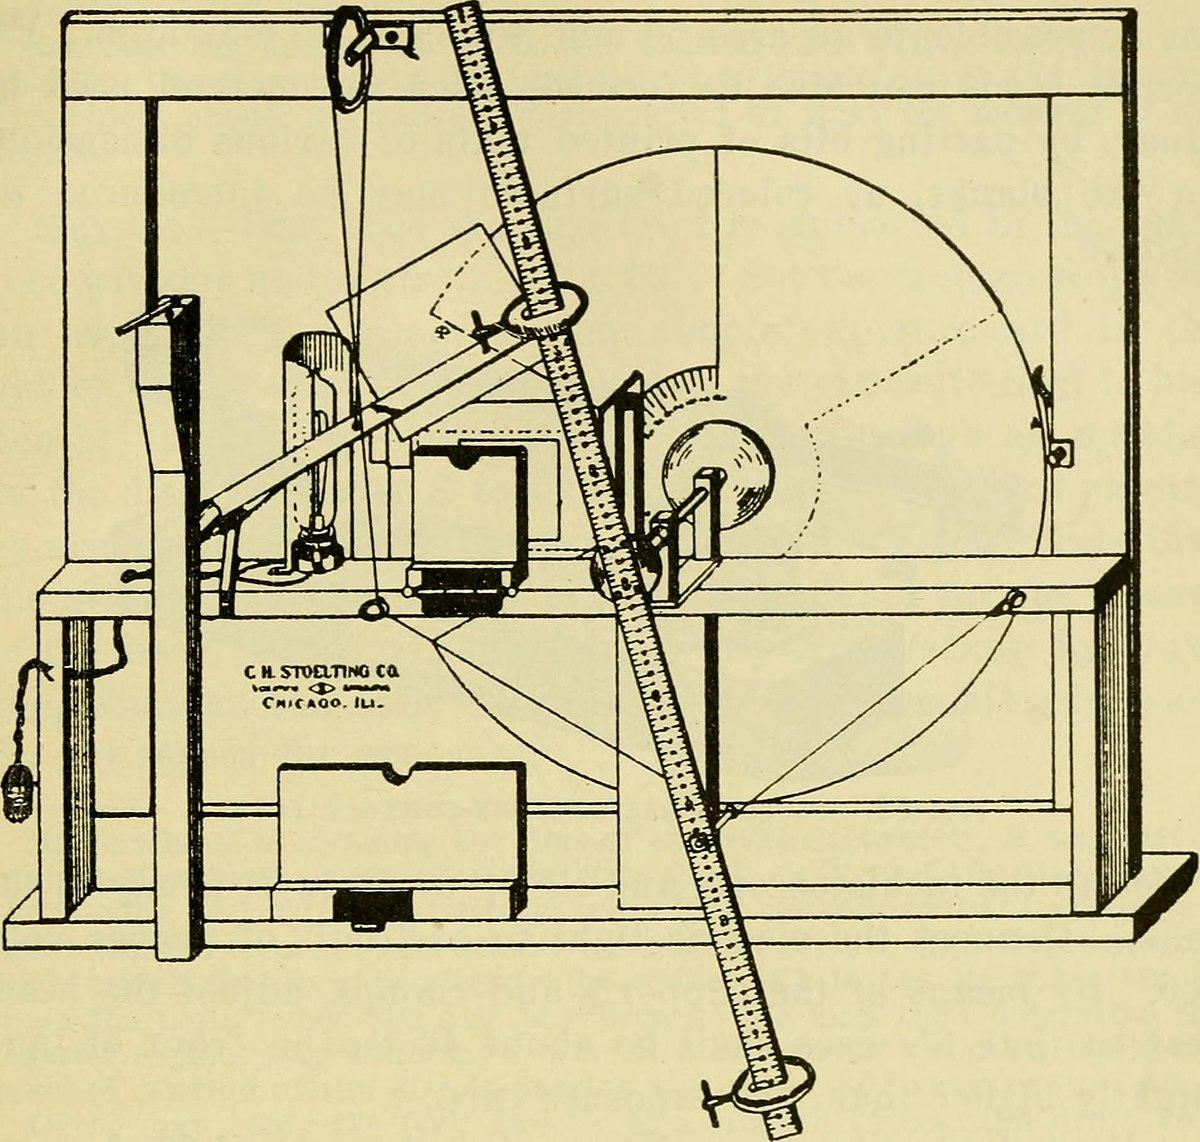 Tachistoscopio - Wikipedia